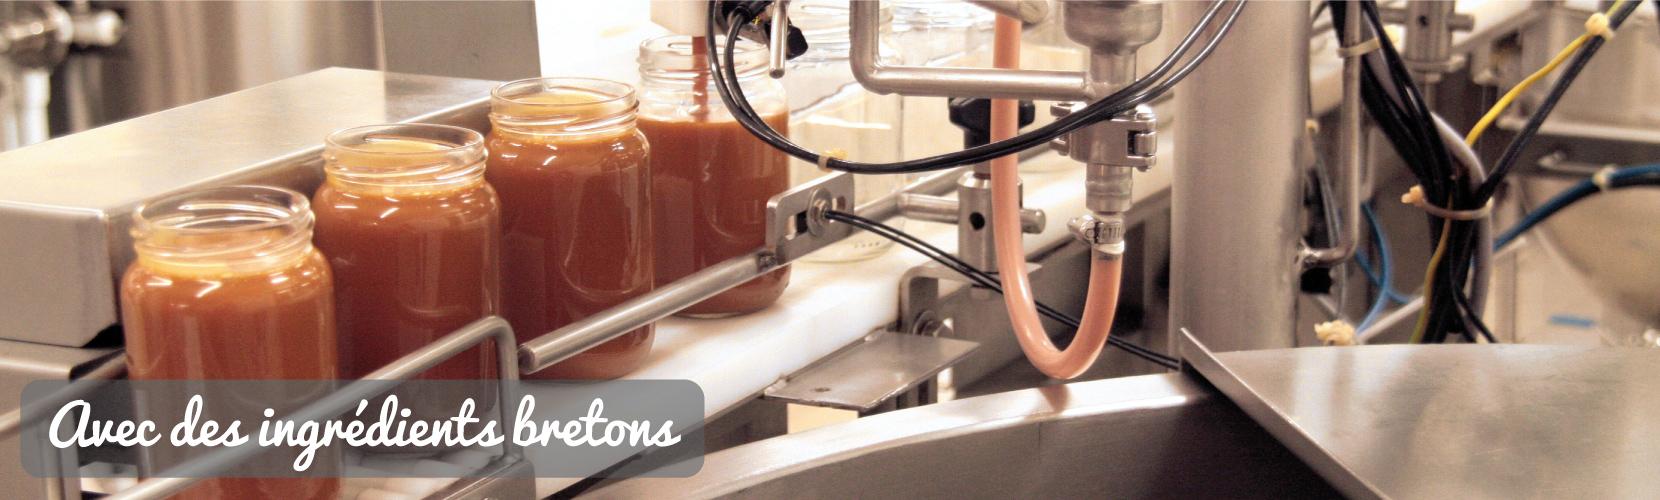 iingredients bretons caramel